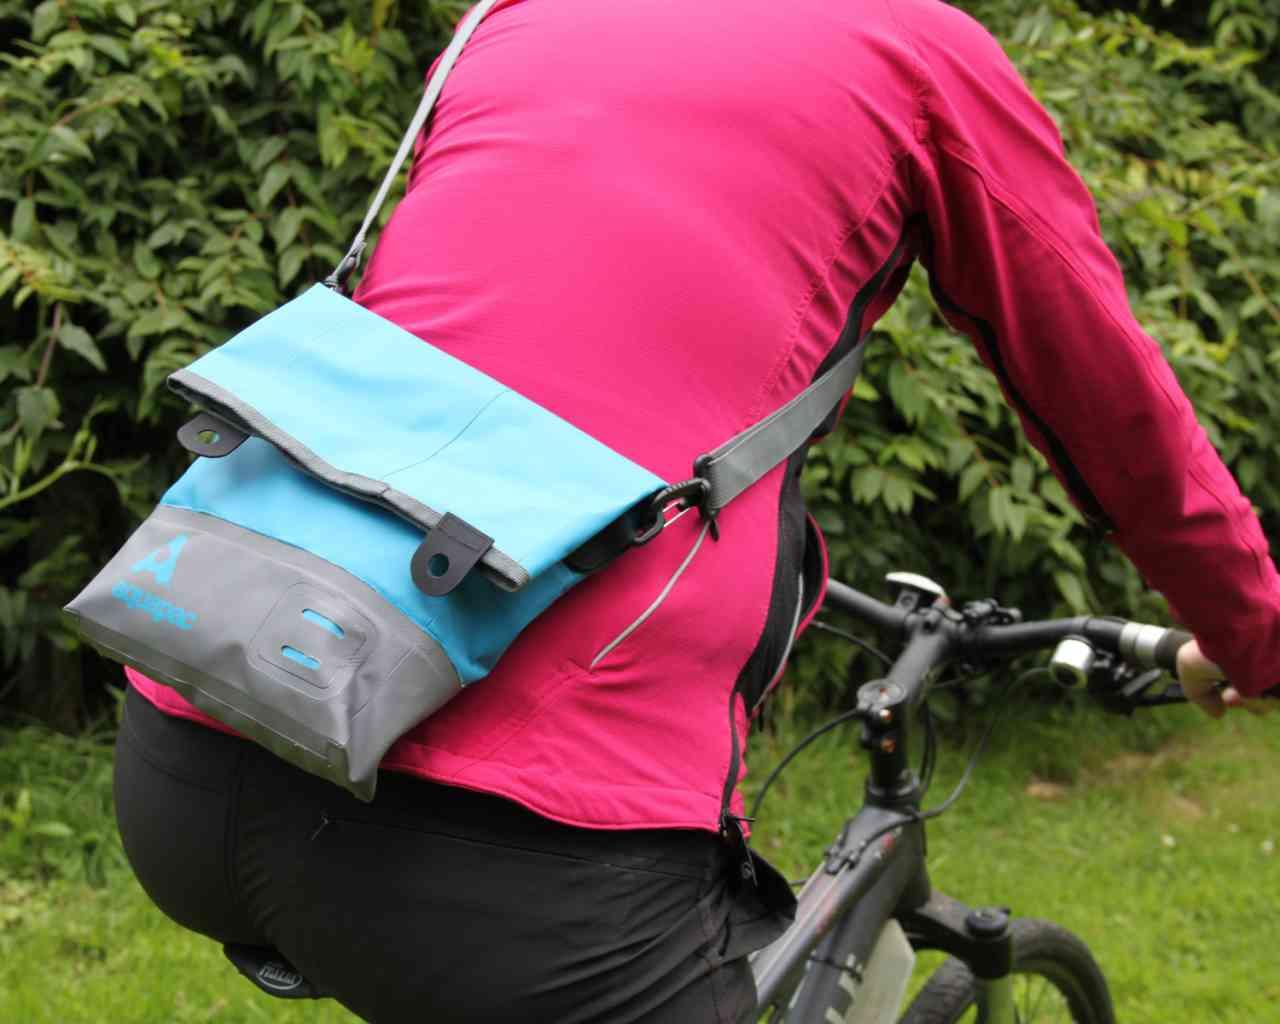 Брызгозащитная сумка Aquapac 052 - TrailProof™ Tote Bag – Small.. Aquapac - №1 в мире водонепроницаемых чехлов и сумок. Фото 3